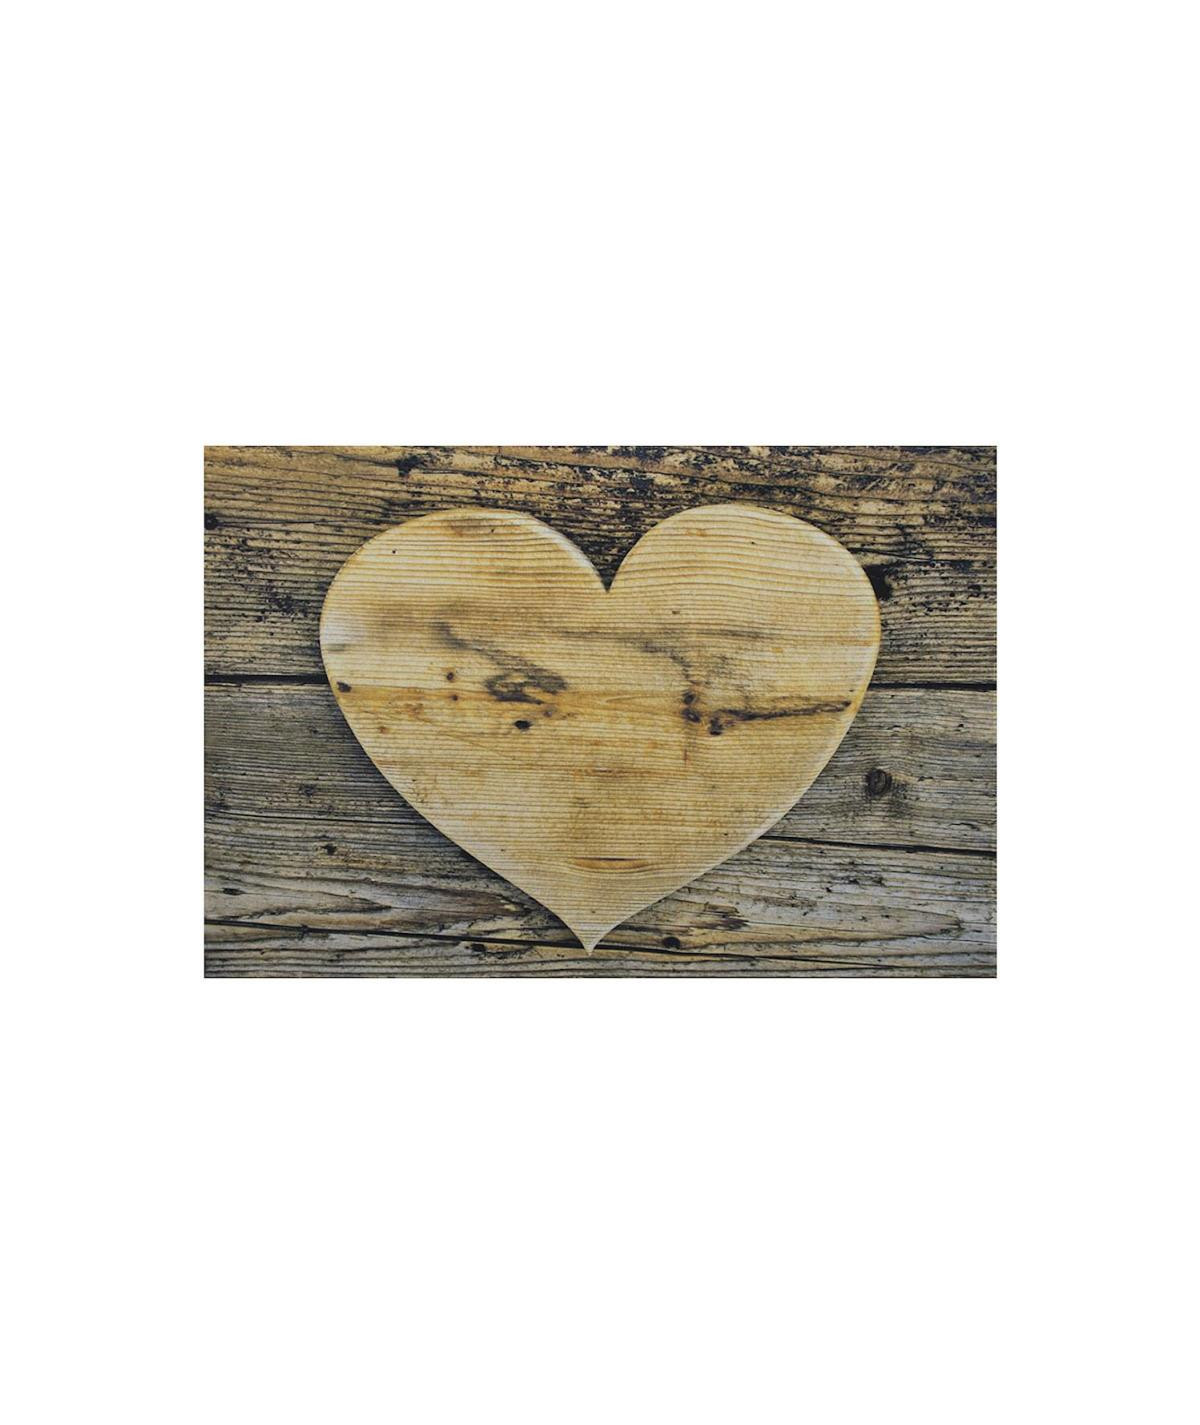 Tapis cuisine lavable 75x50cm - Coeur en bois |YESDEKO